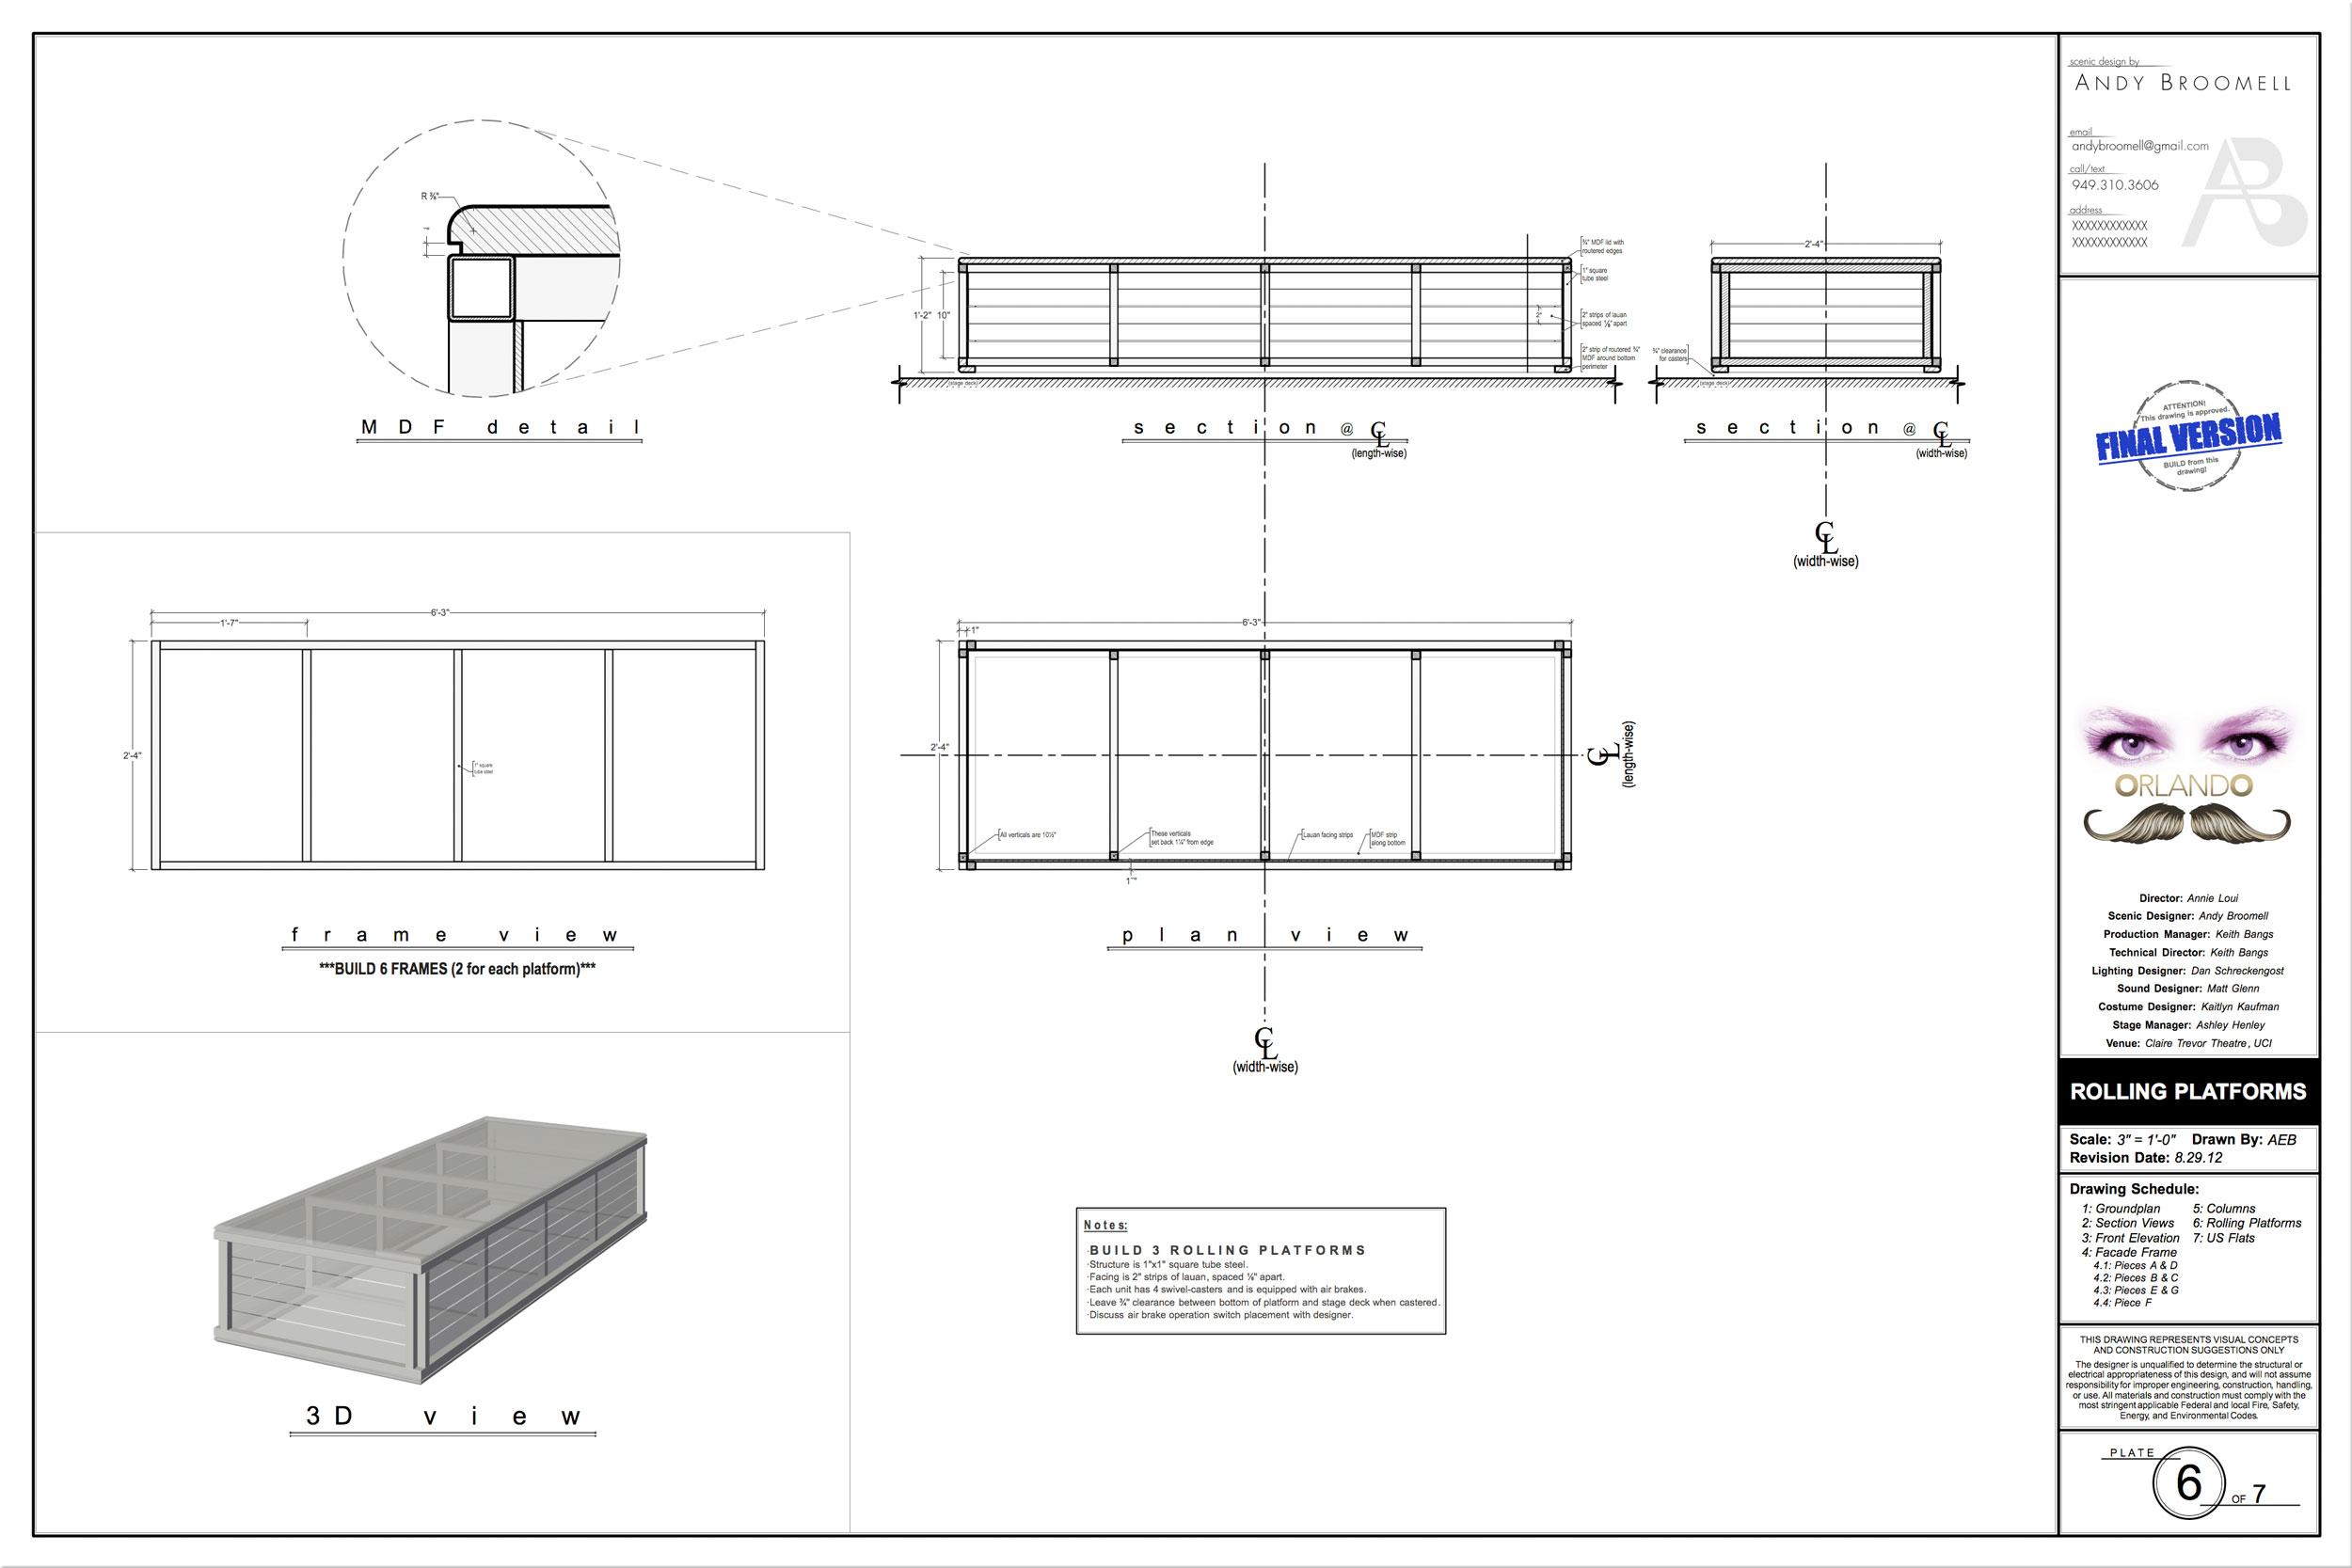 andy-broomell-scenic-design-drafting-orlando-6.jpg